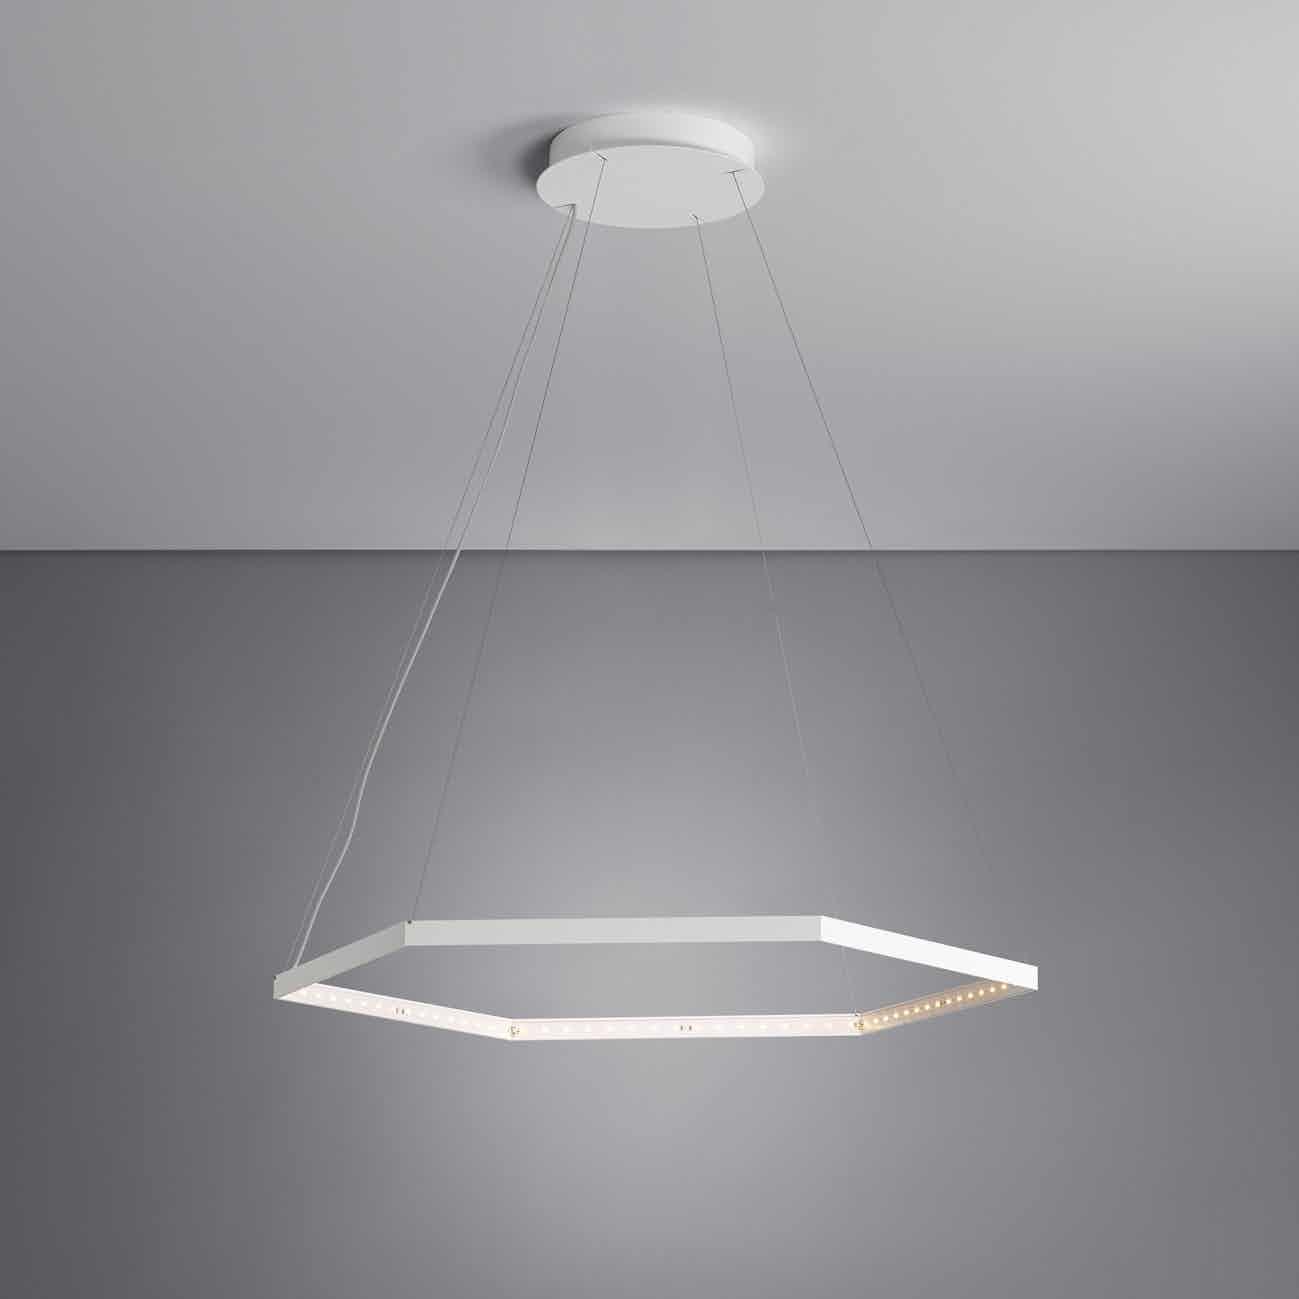 Le deun luminaires hexa 1 hanging lamp white ceiling haute living 190415 181915